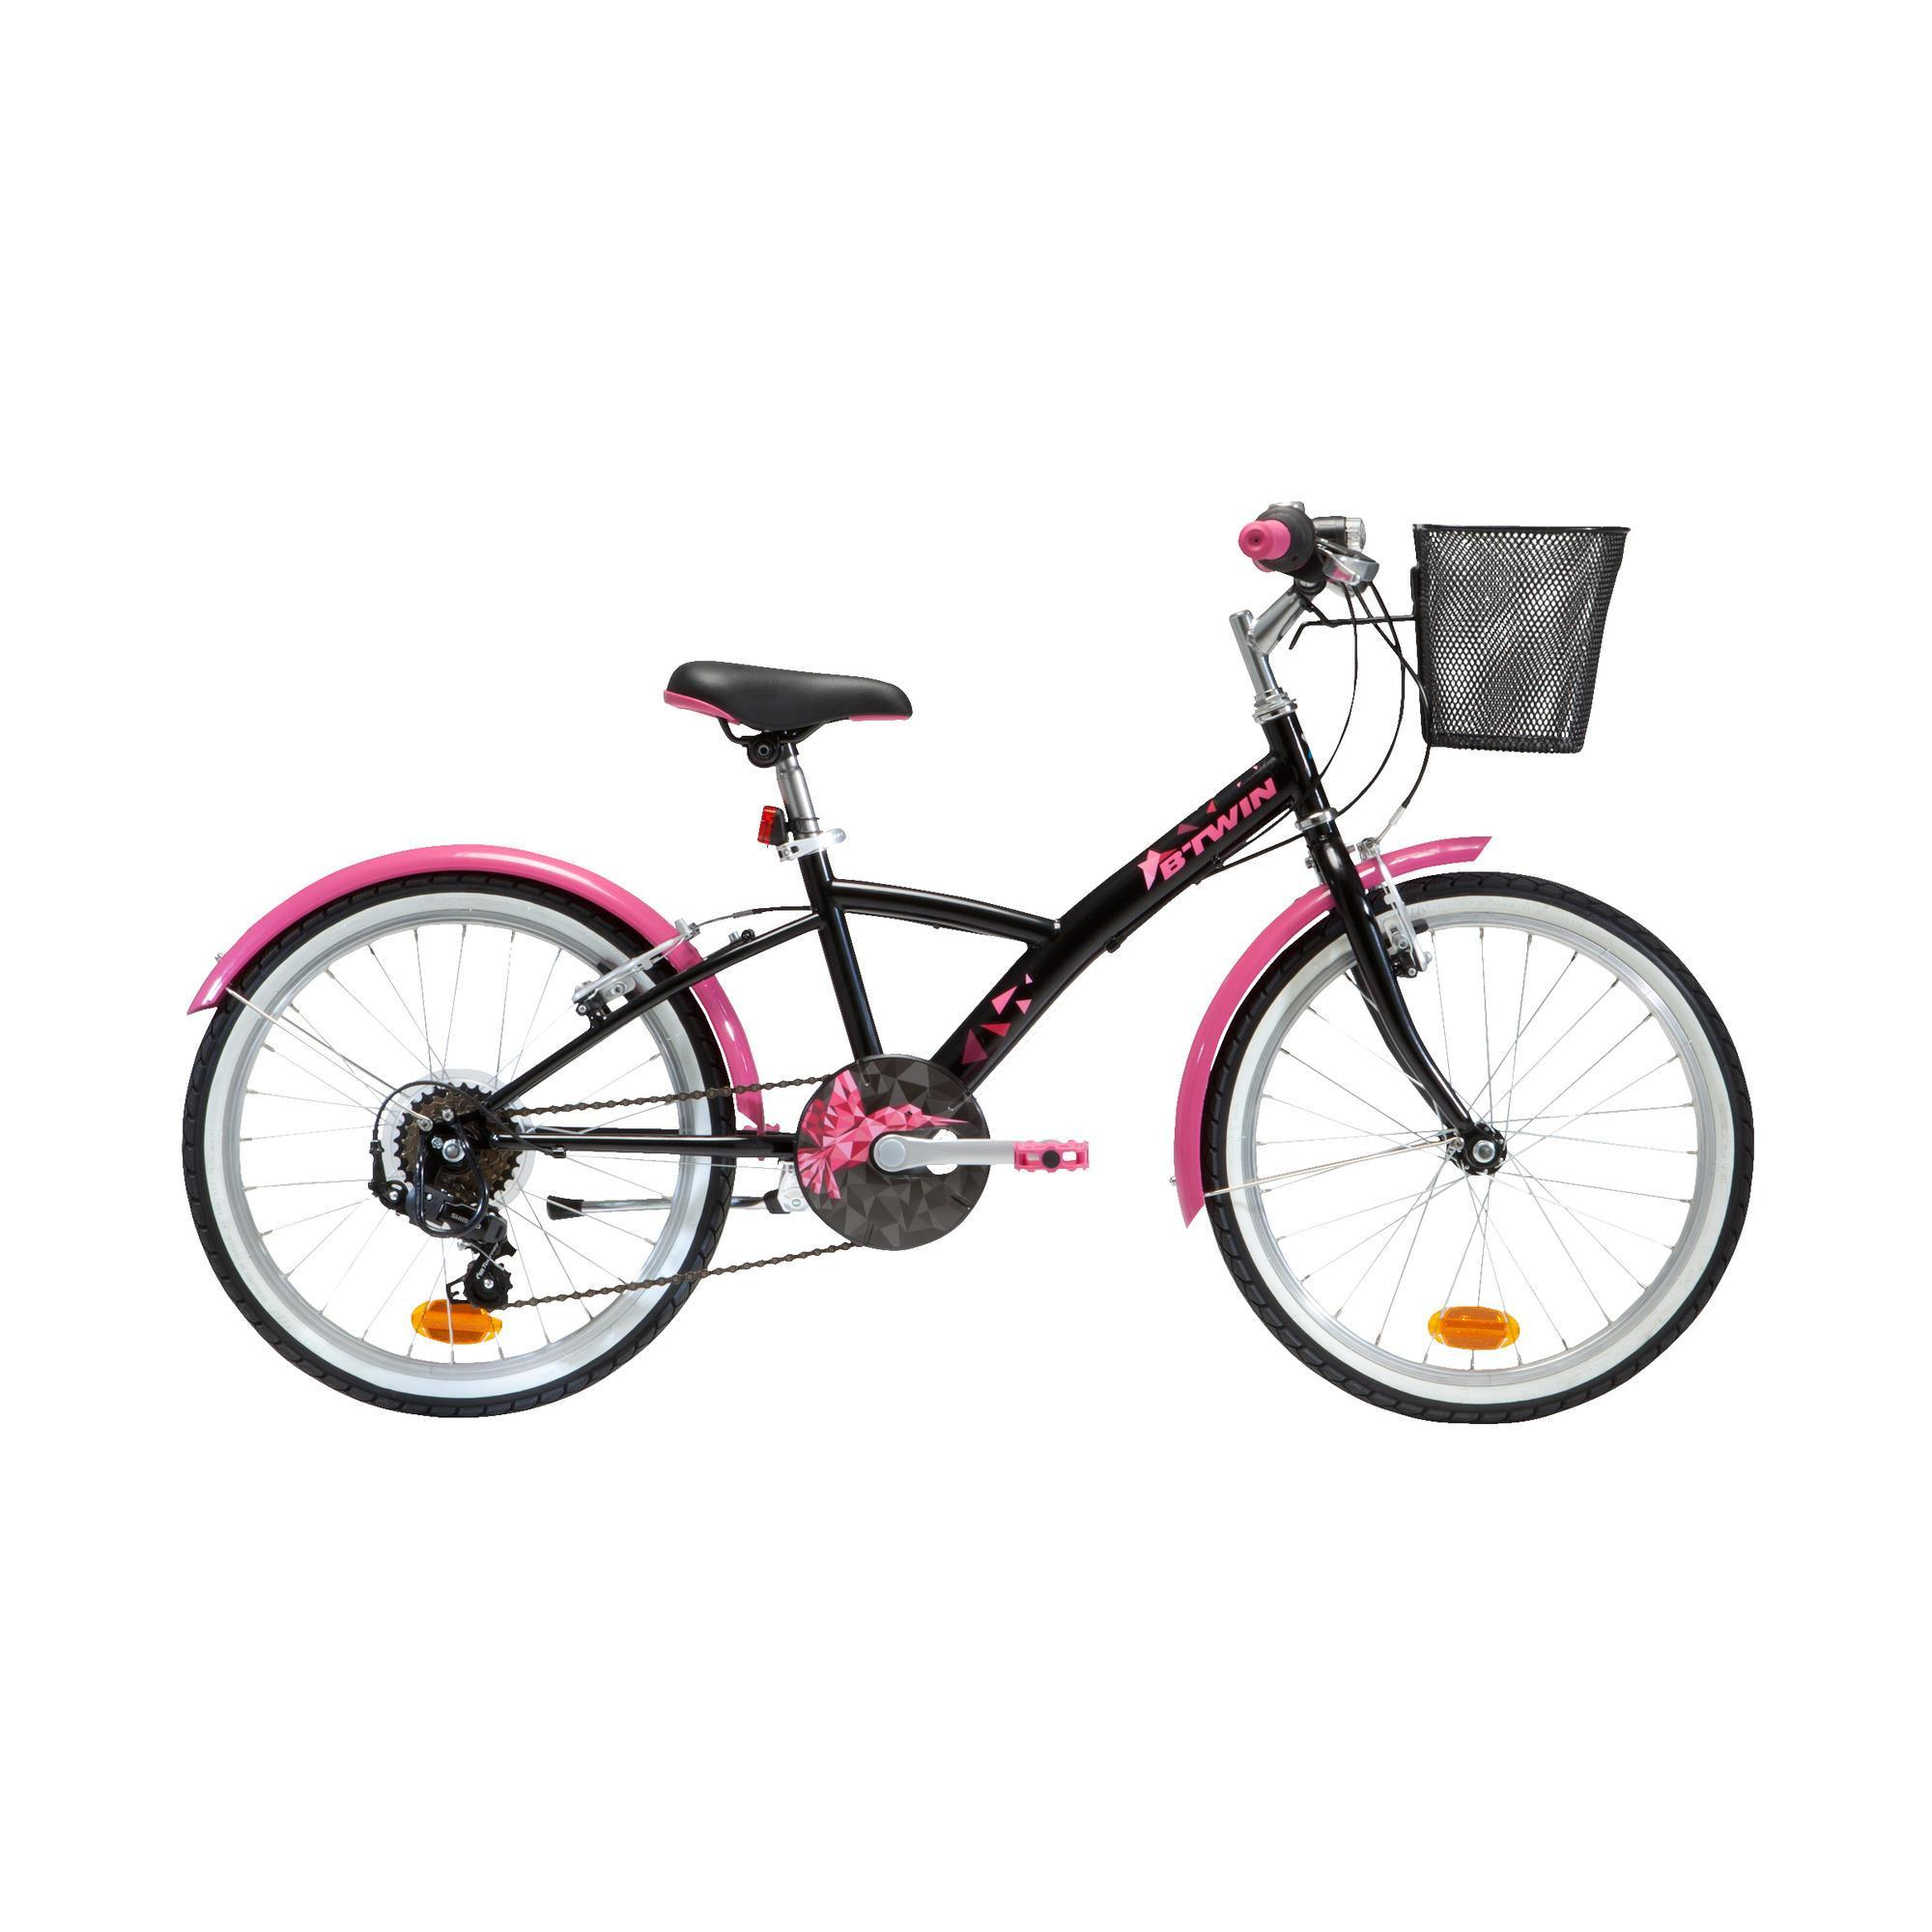 6c88d3802 Comprar Bicicletas Online | Decathlon